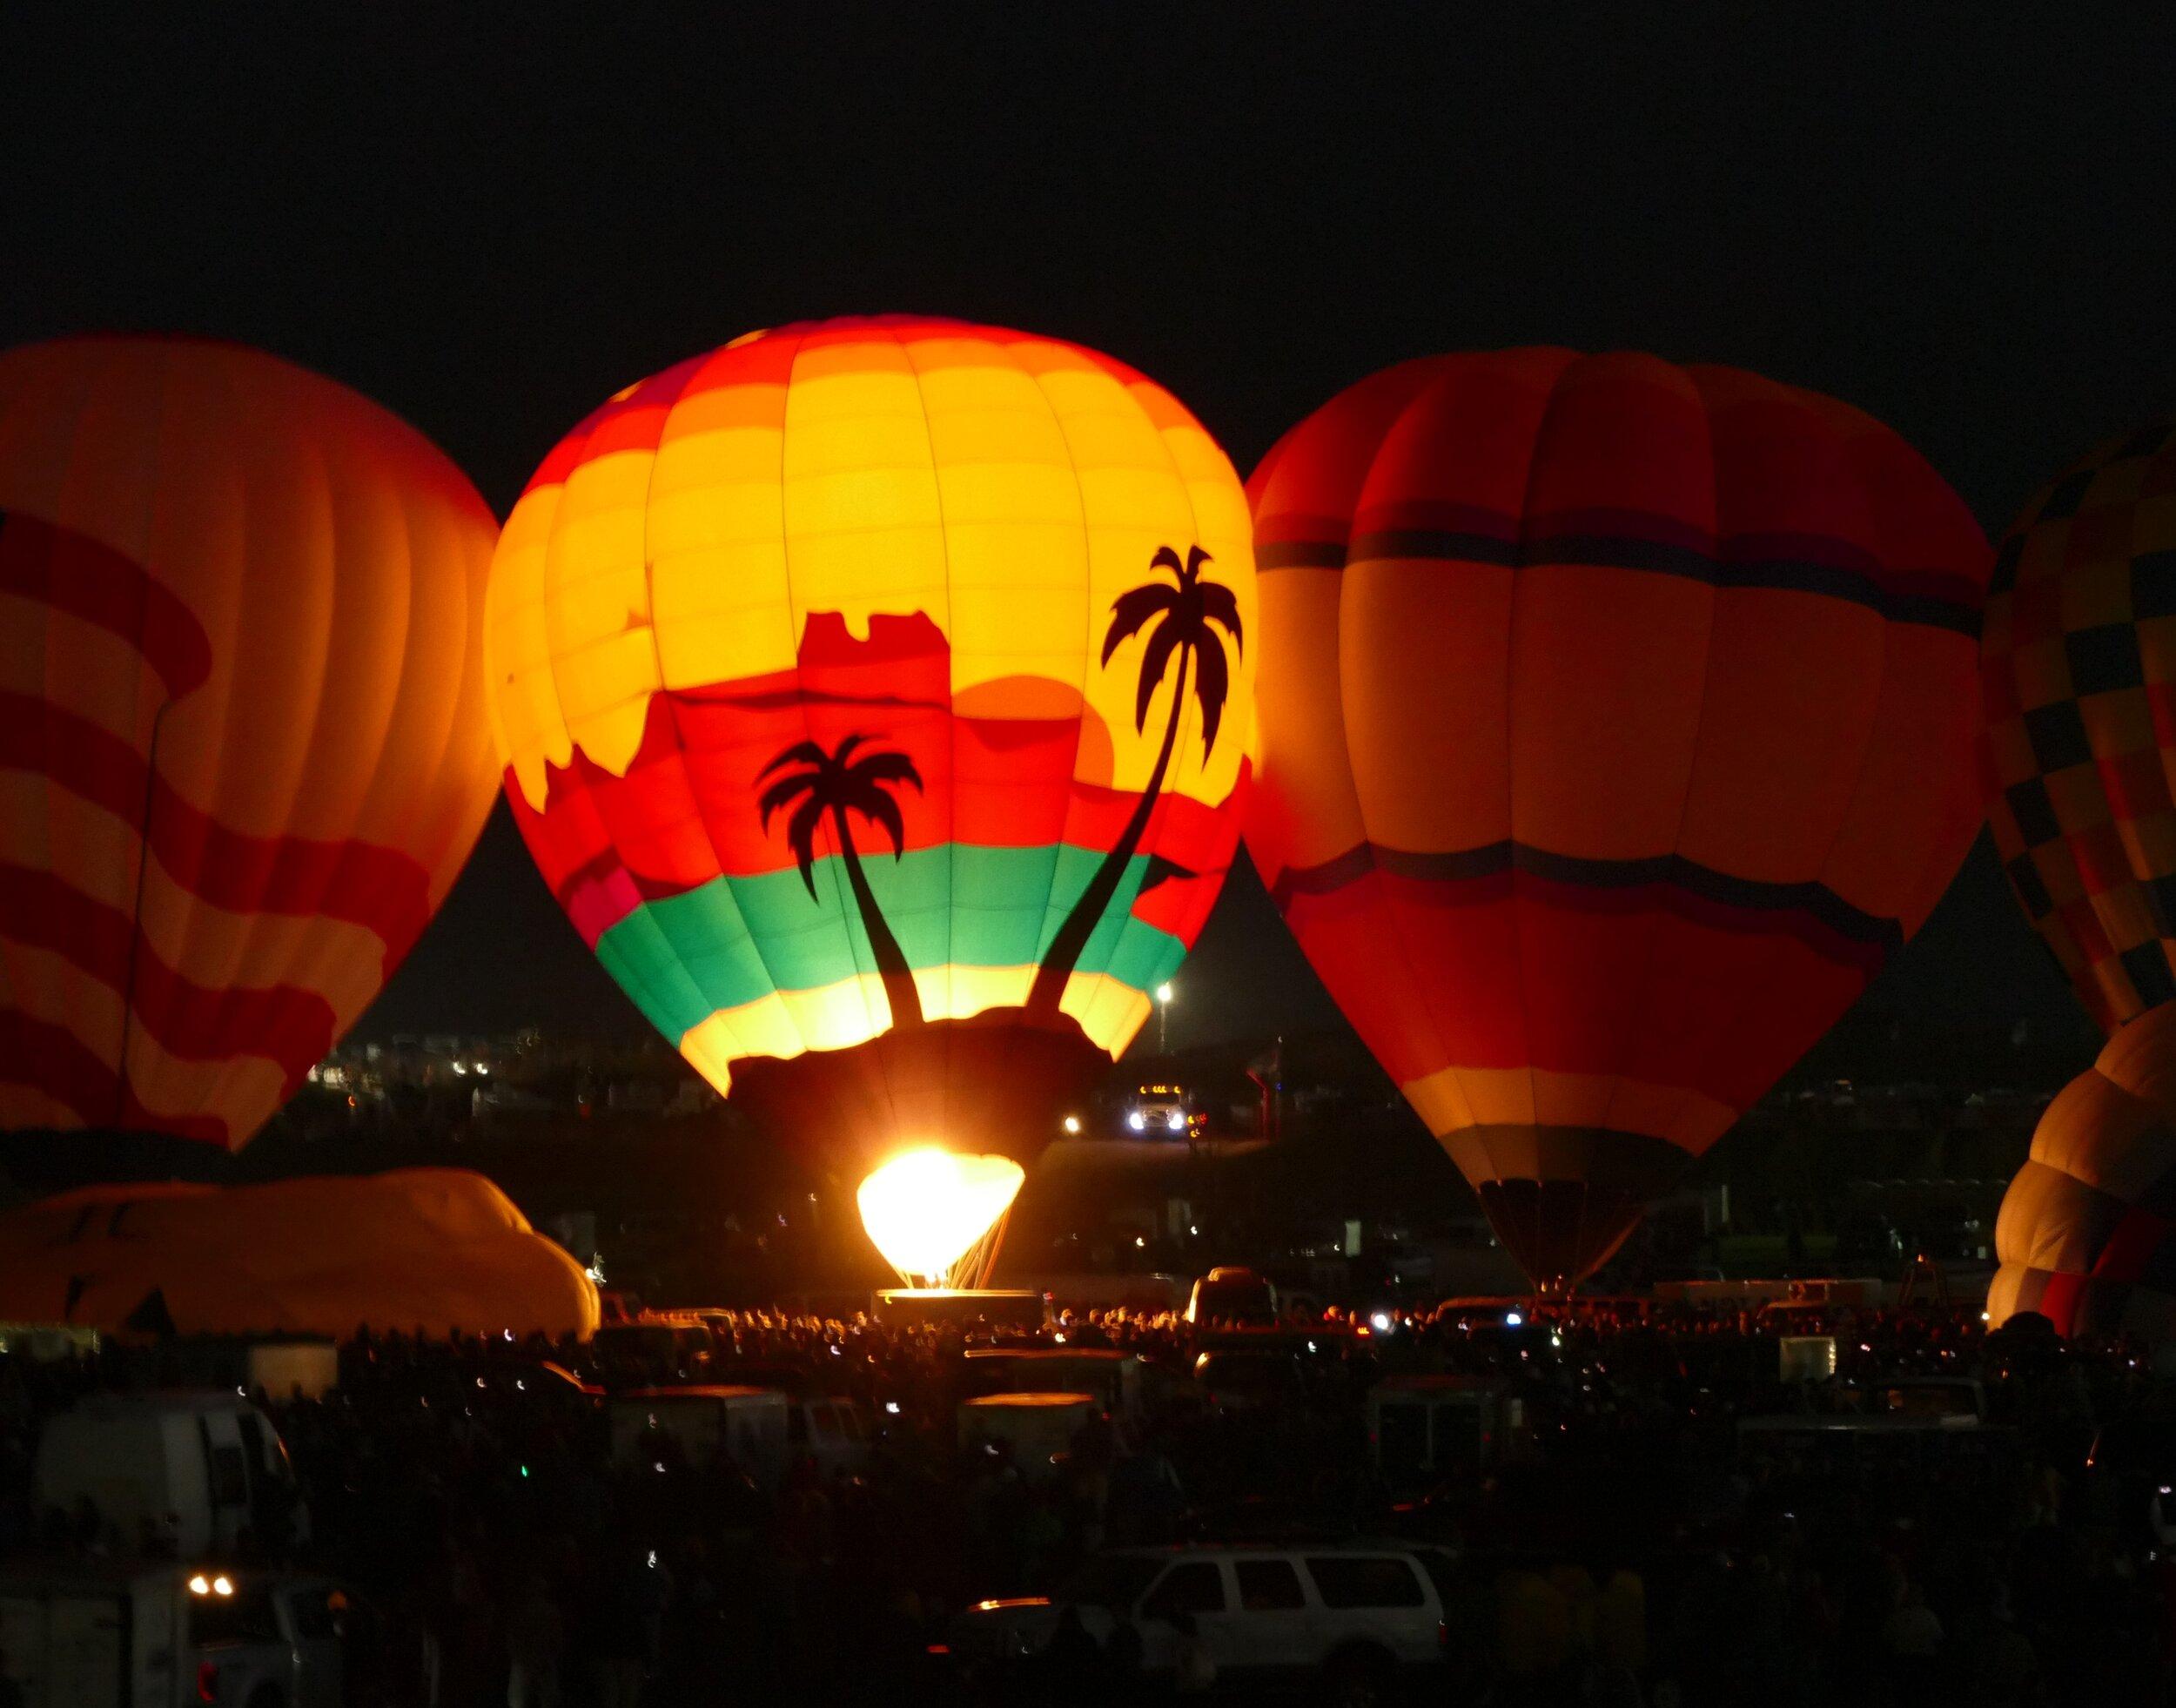 Dawn Patrol at the Albuquerque Balloon Fiesta